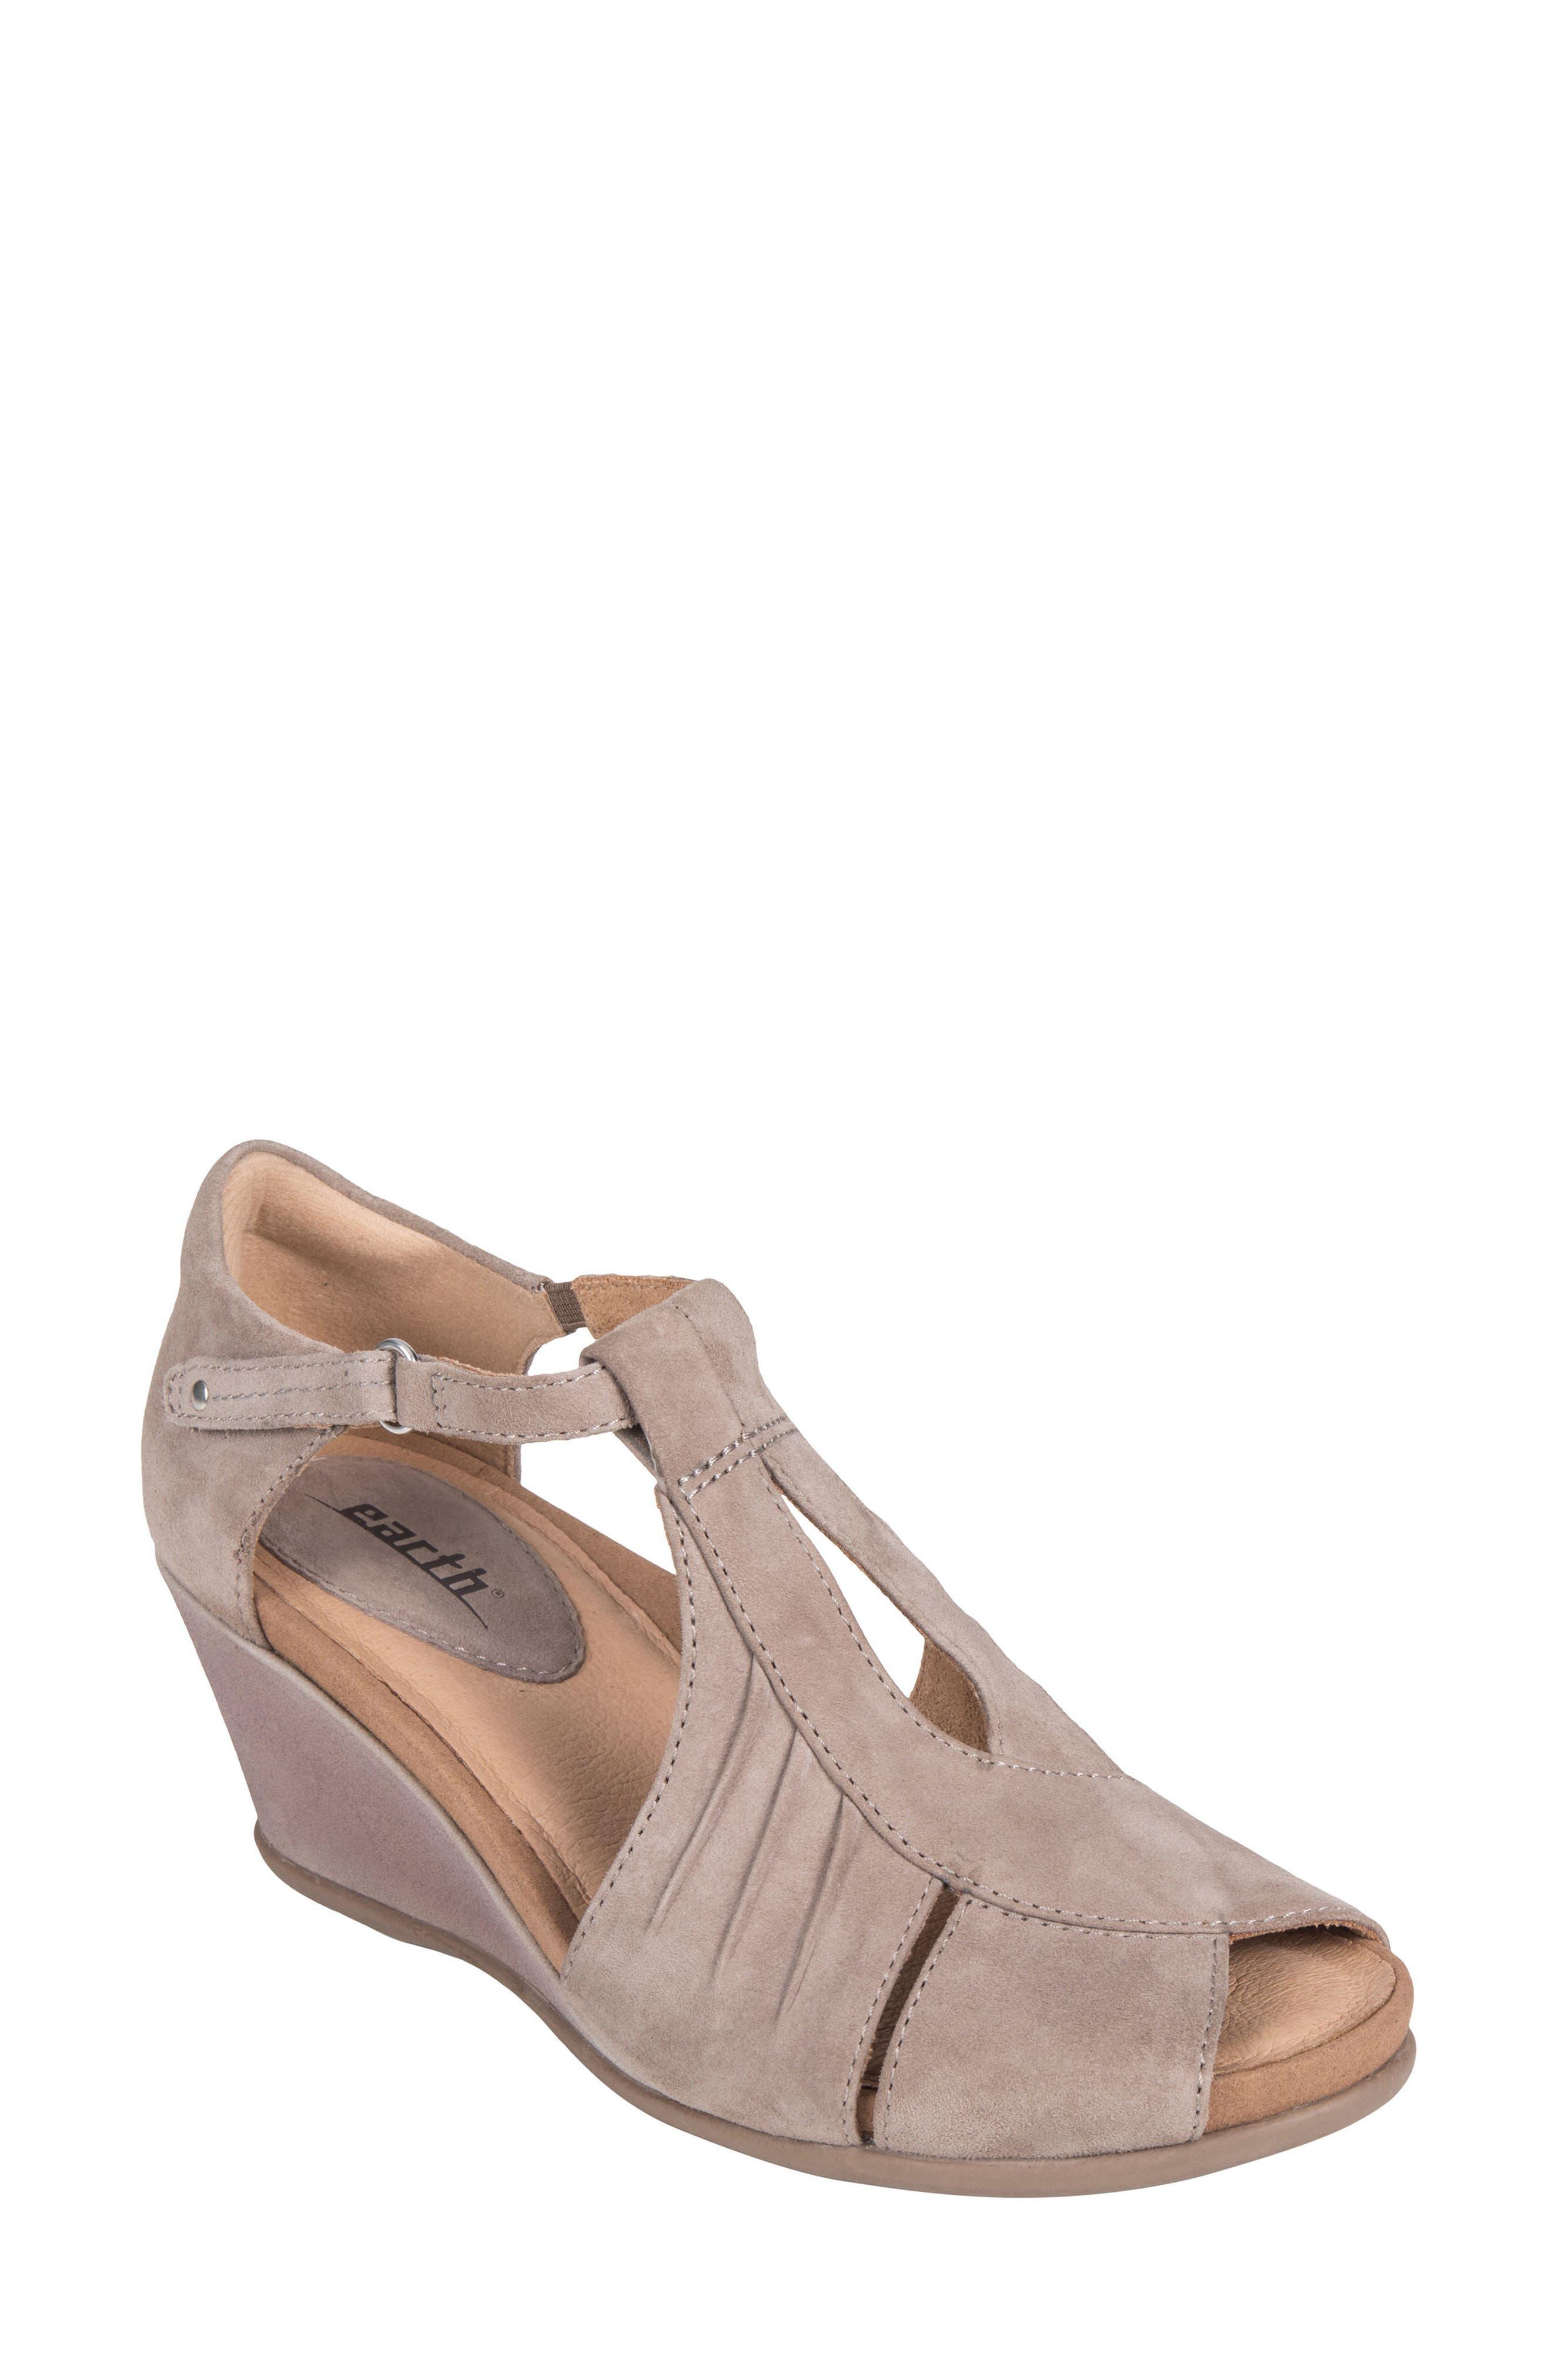 Primrose Wedge Sandal,                         Main,                         color, Ginger Suede